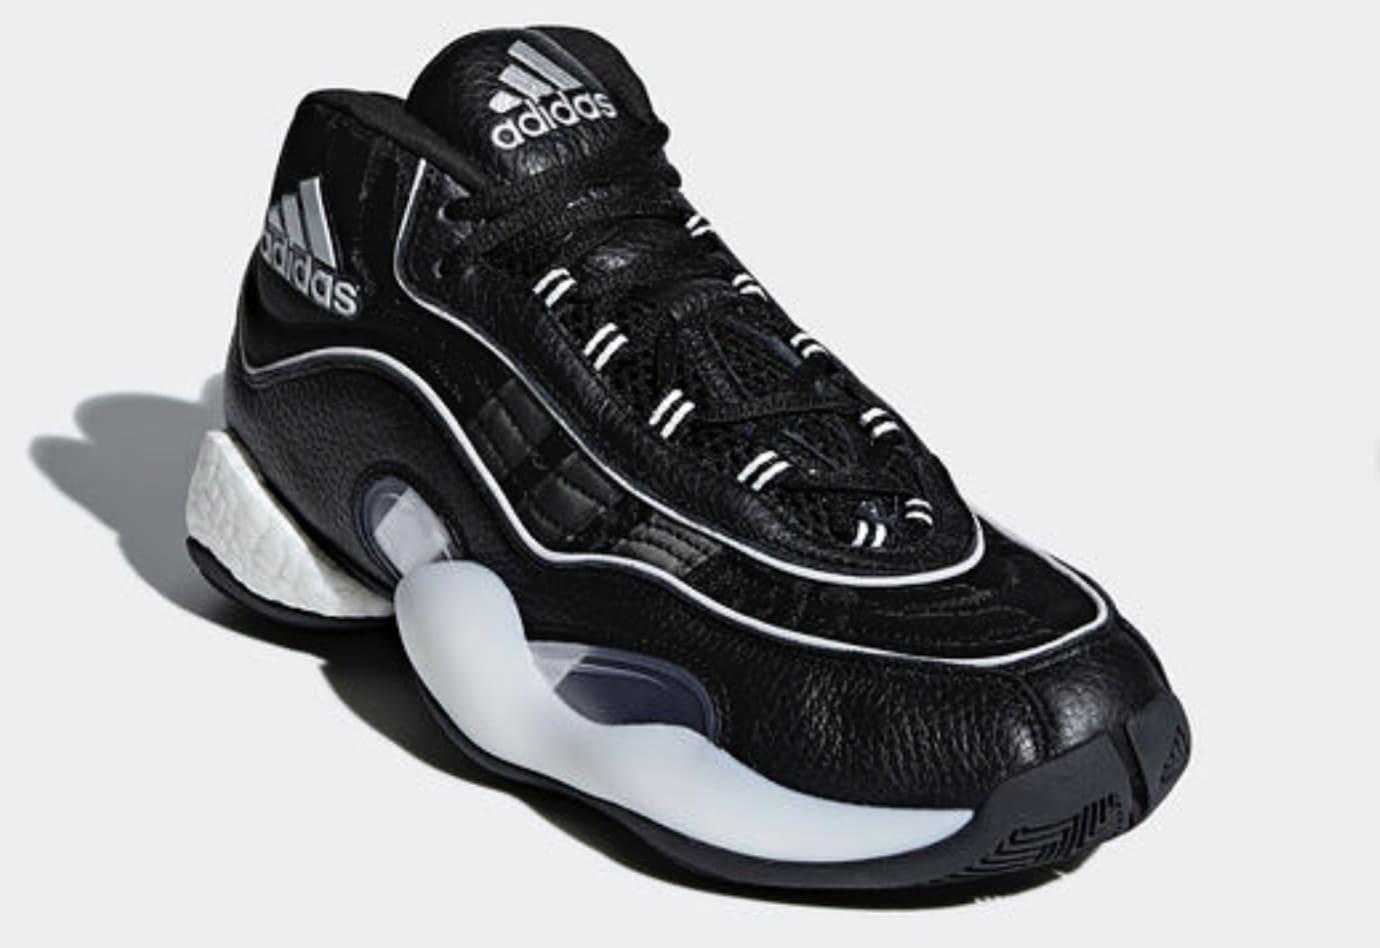 newest ea981 e0704 Image via sneakerhighway23 · Adidas KB8 2Crazy 2 BYW (Toe)